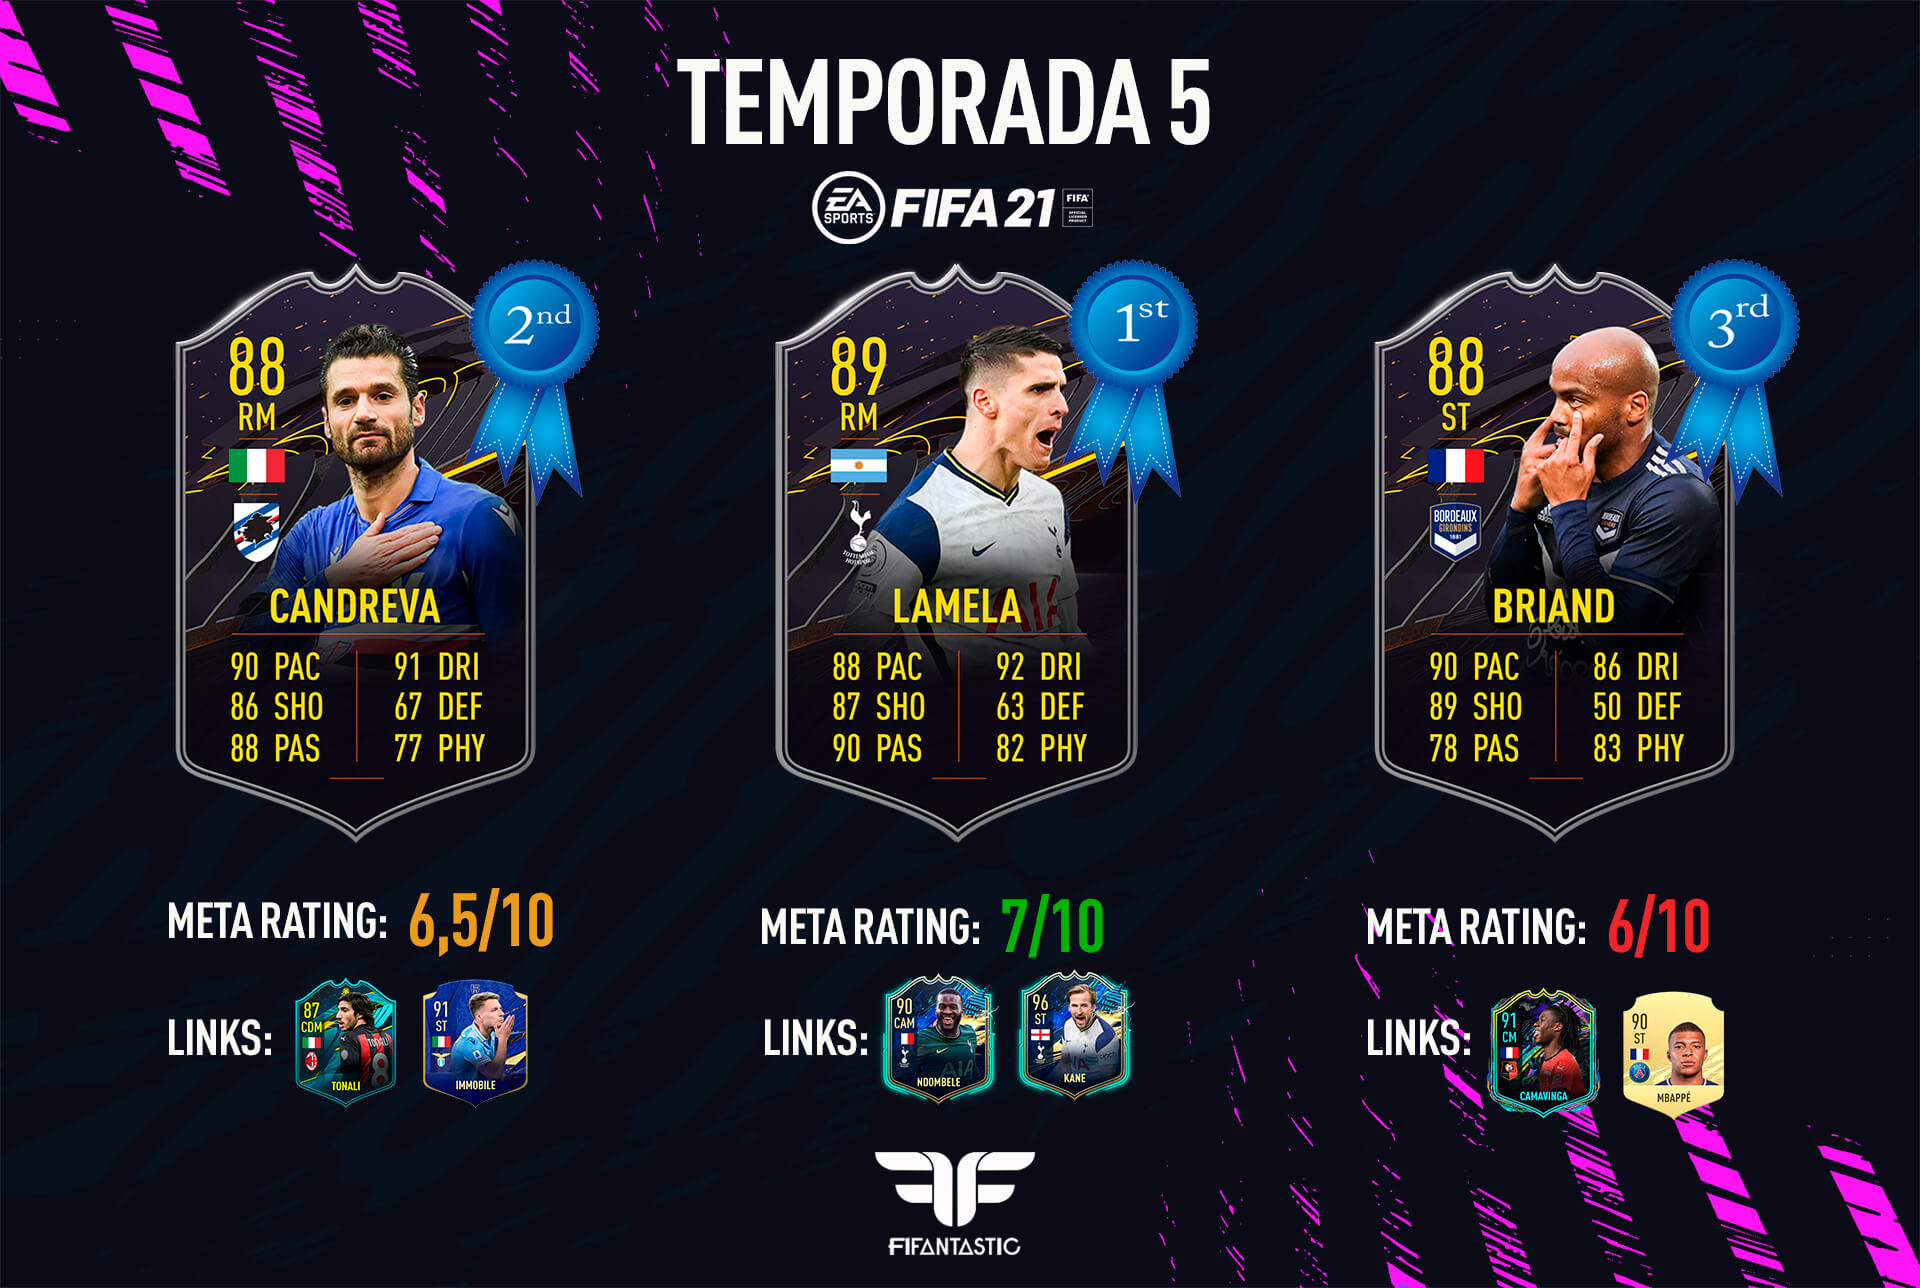 Jugador del nivel 30 de la Temporada 5 de FIFA 21 Ultimate Team